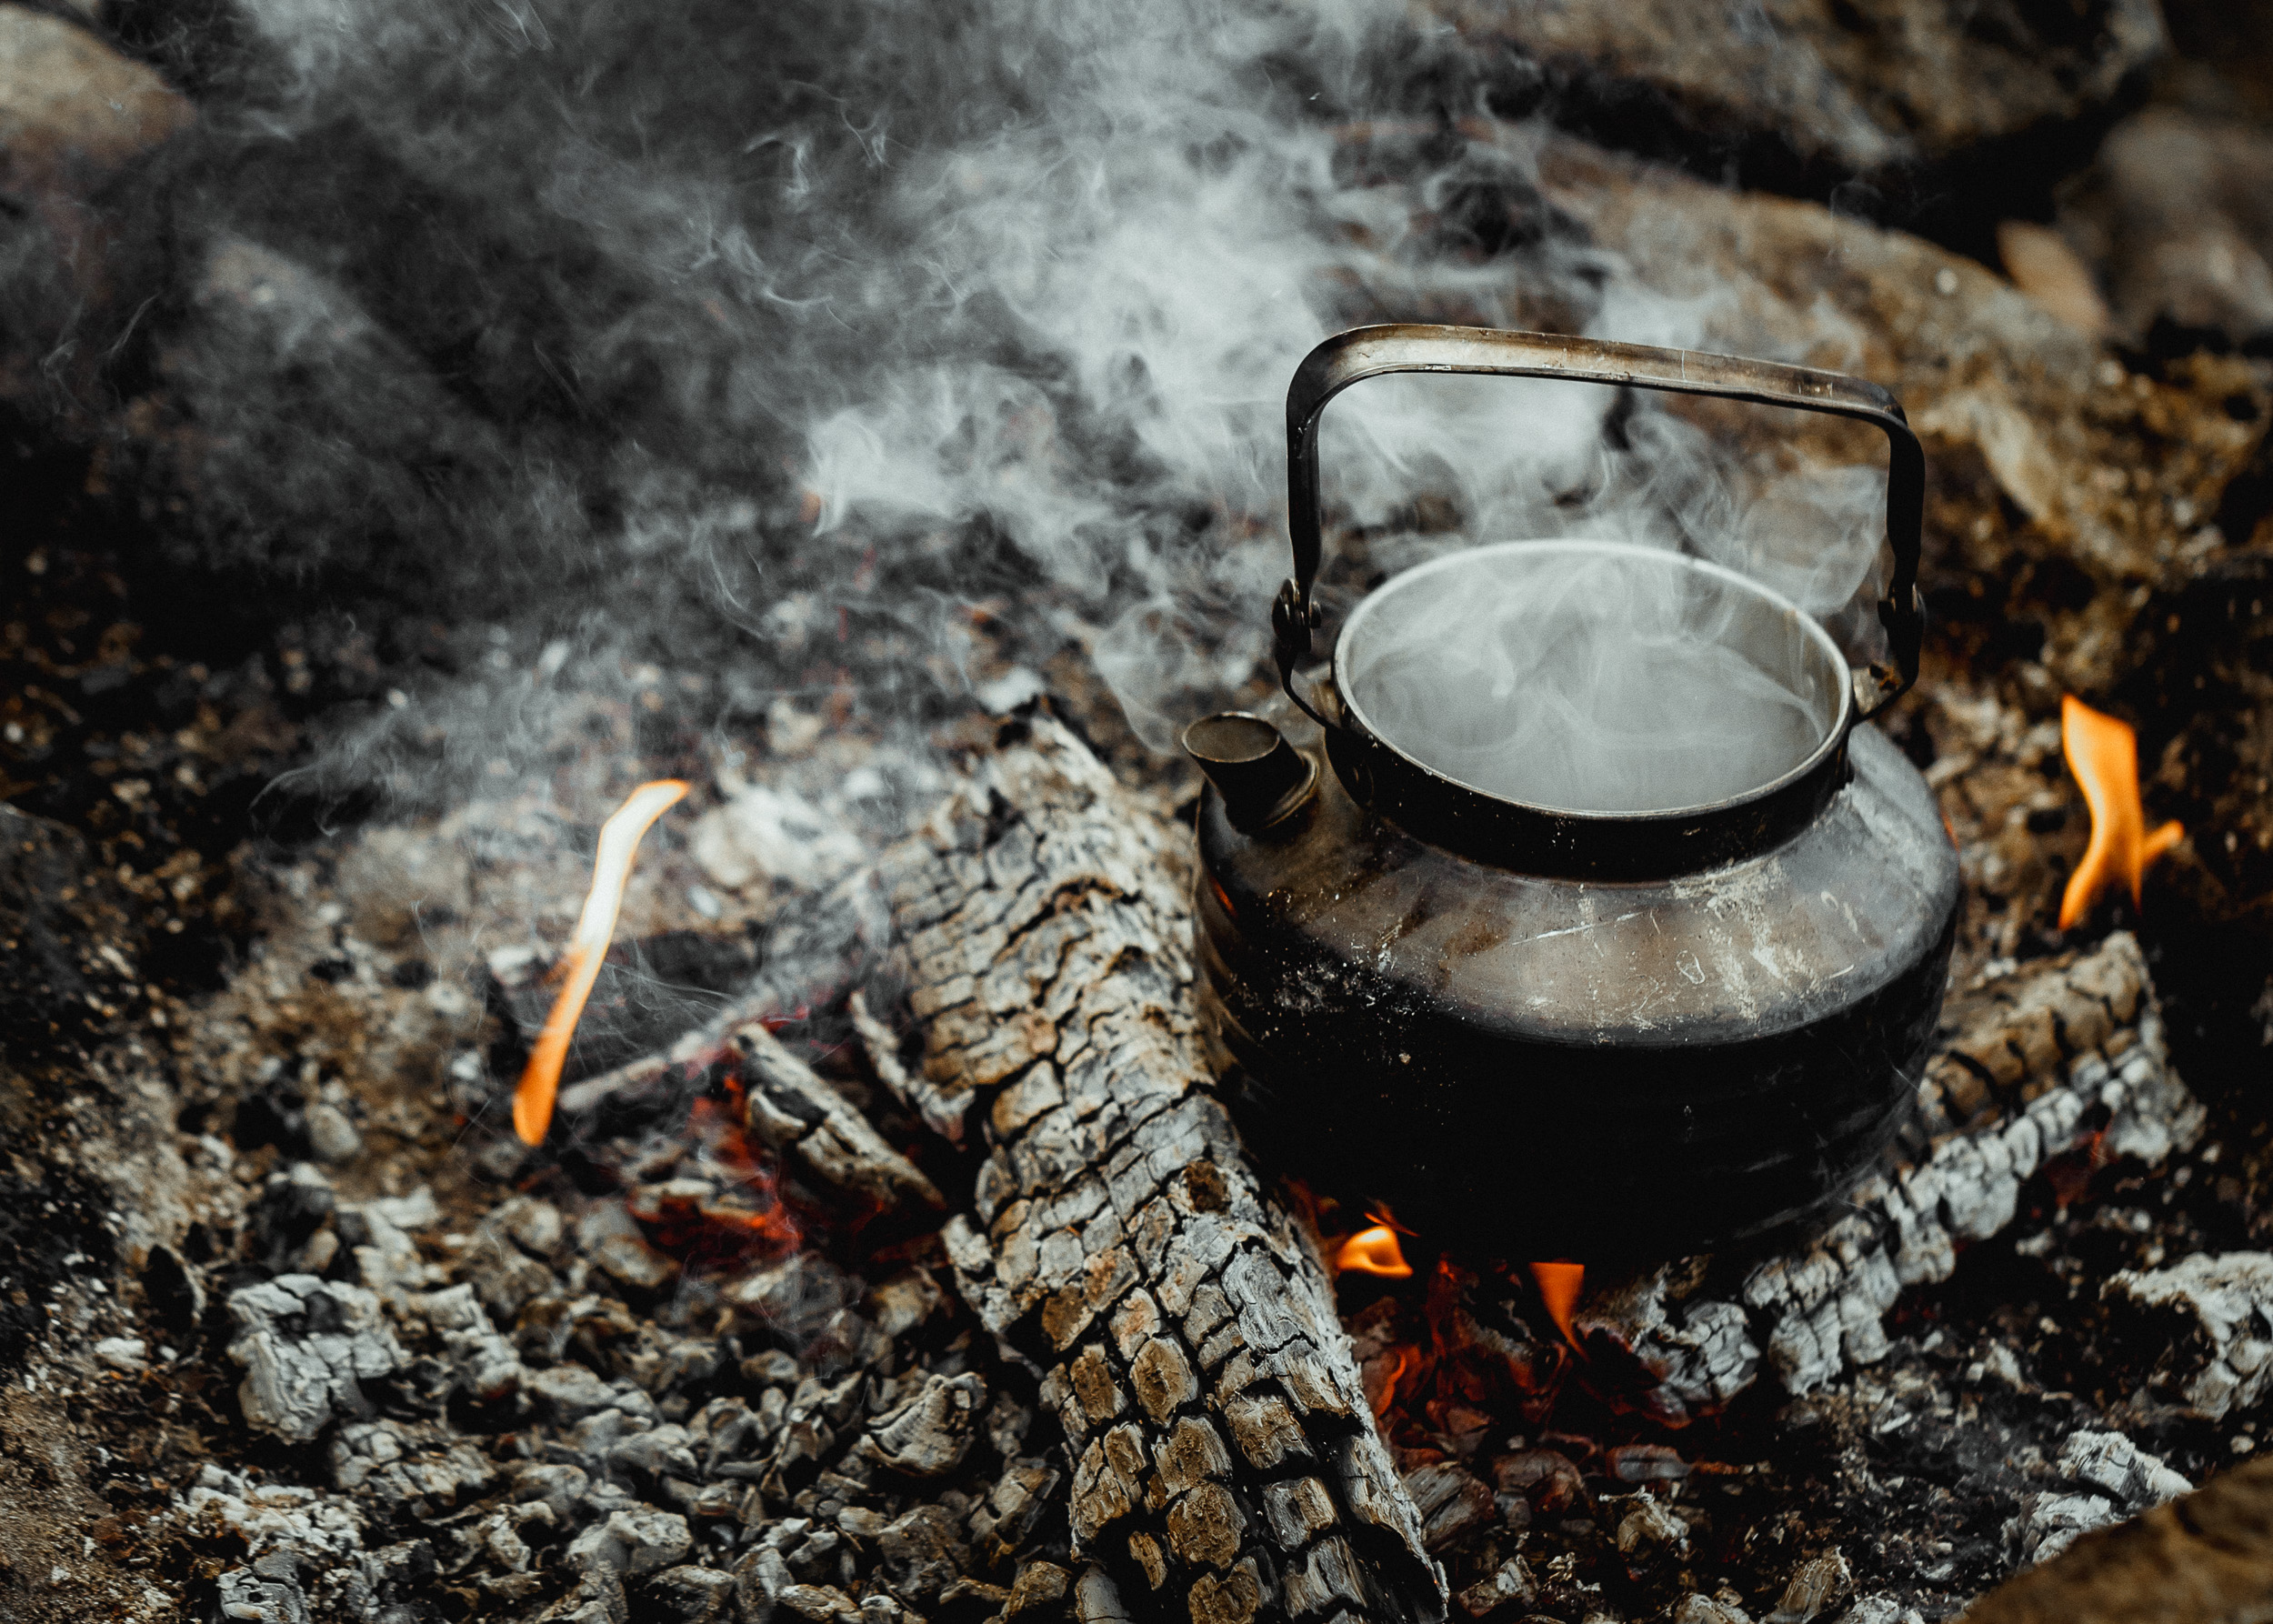 36-finland-camping-campfire-coffee-anna-elina-lahti-photographer.jpg